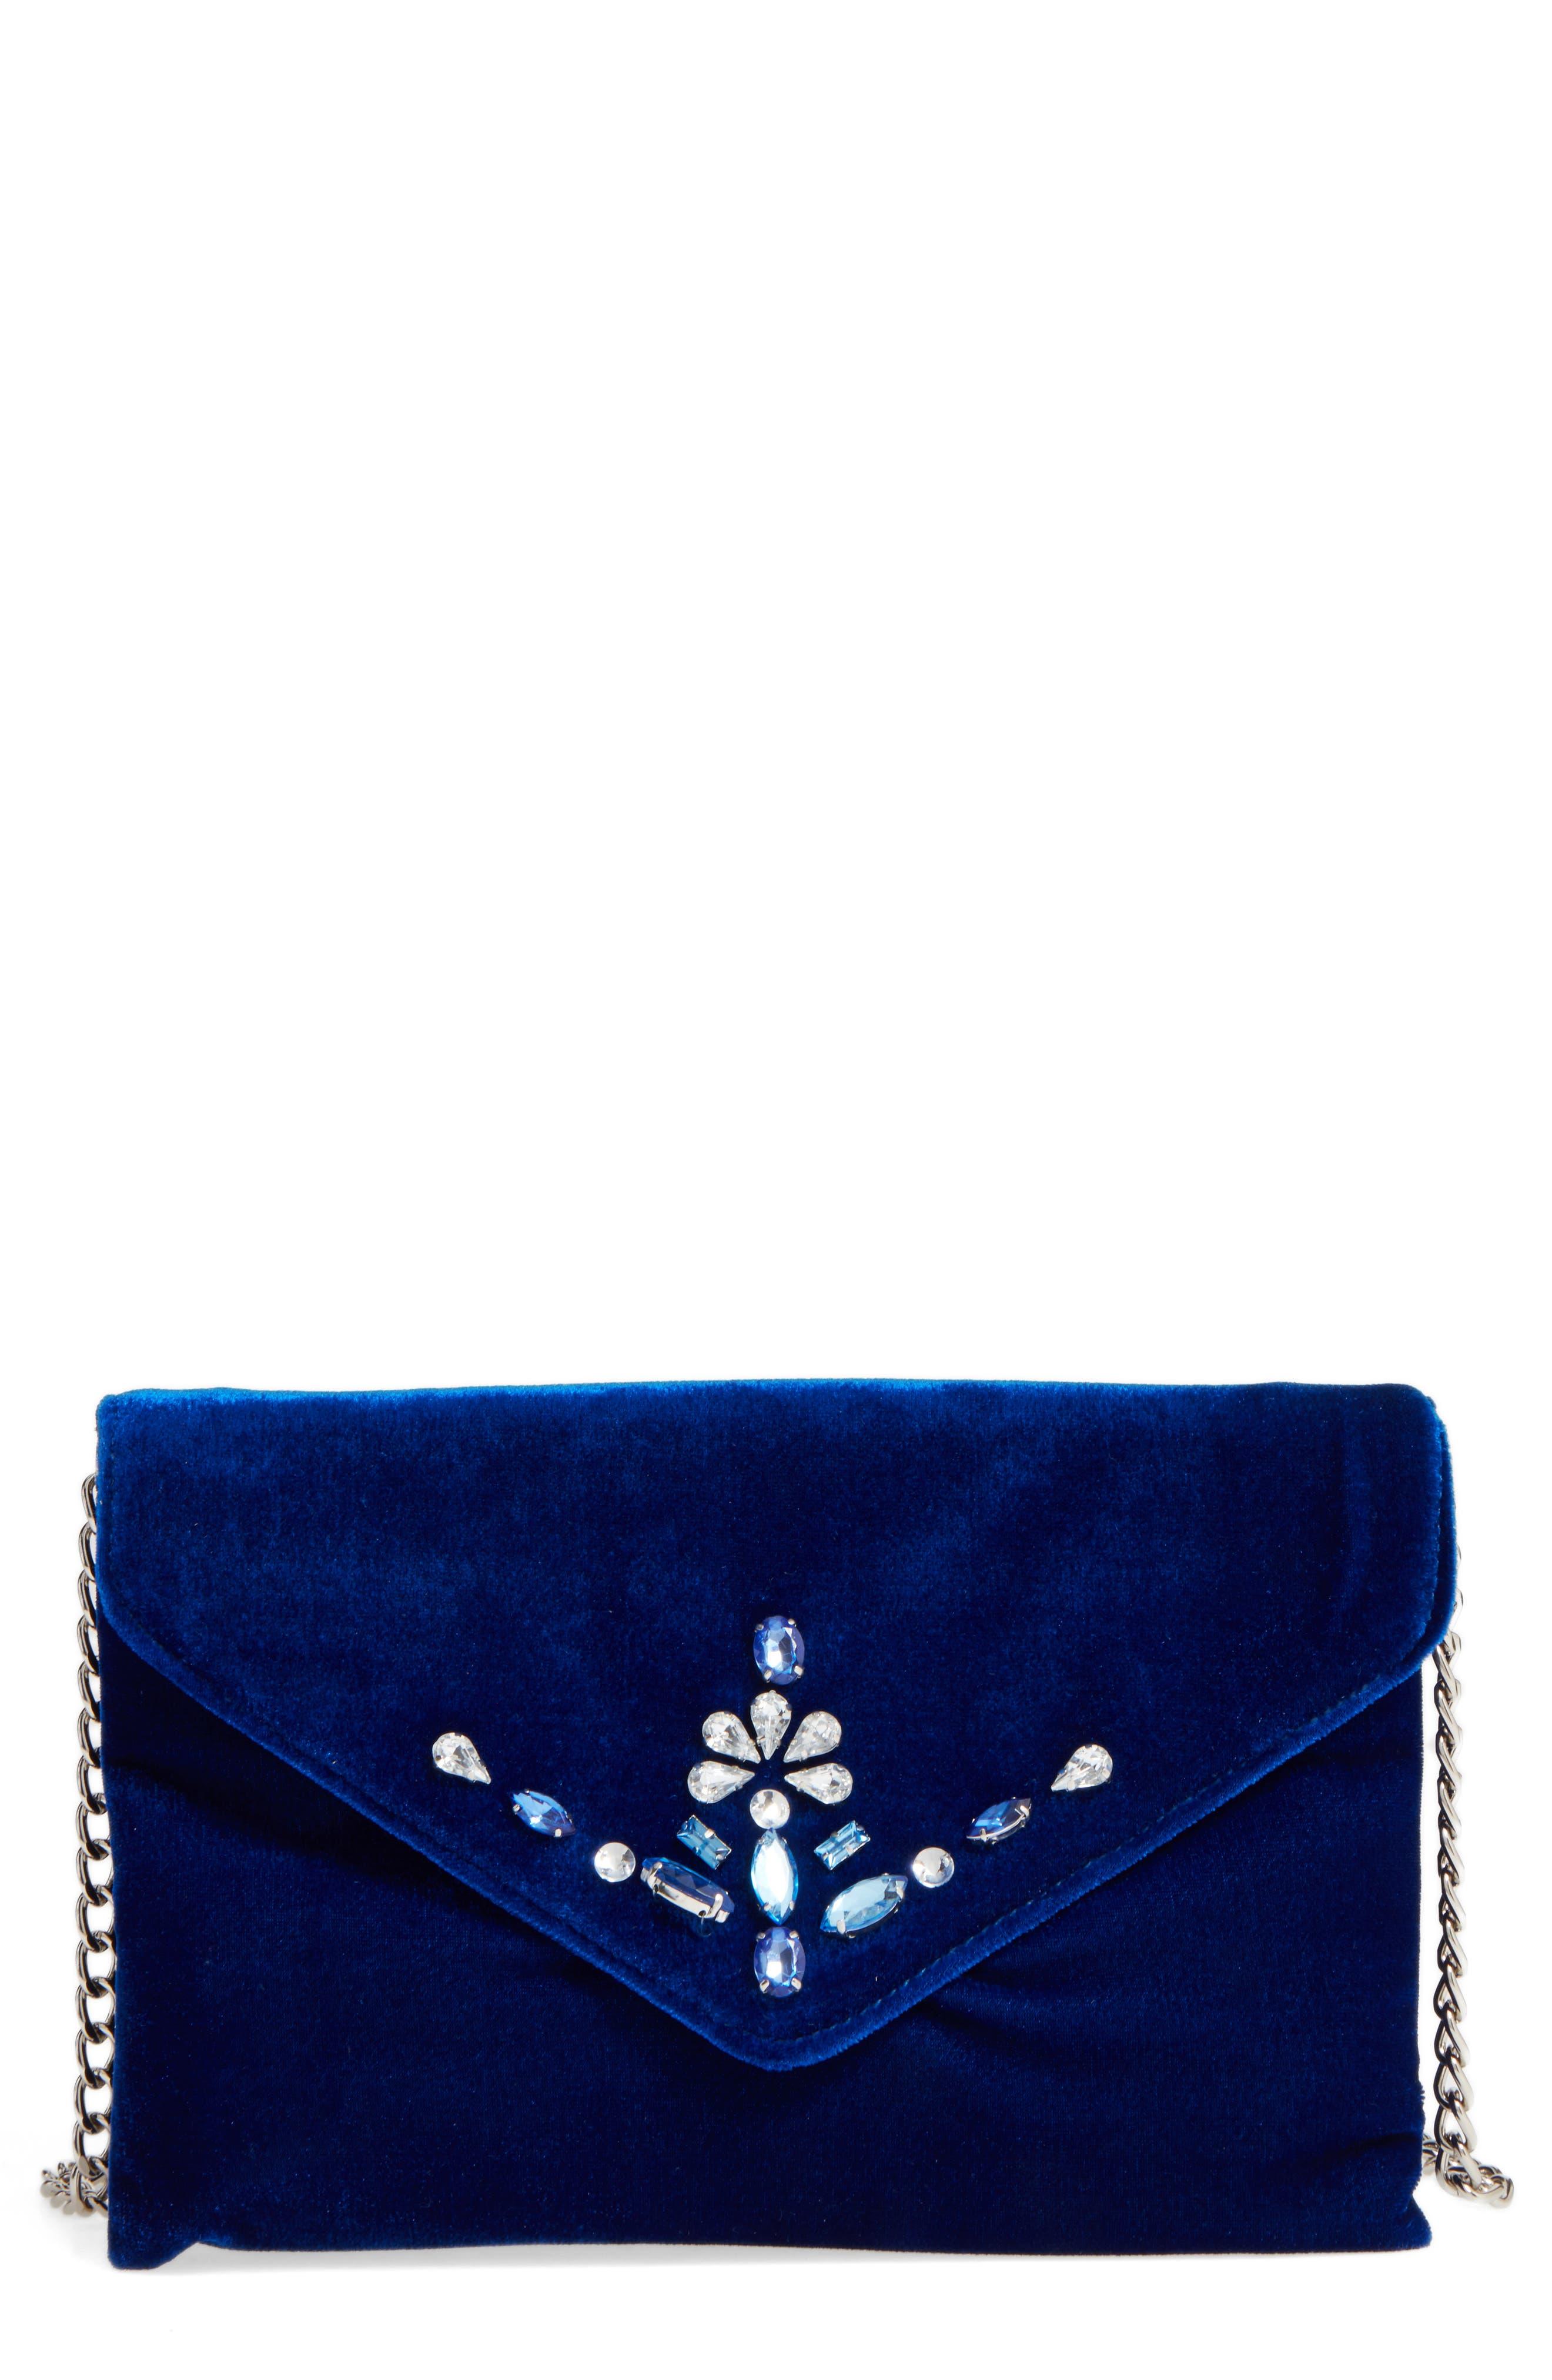 Main Image - BP. Jeweled Flap Clutch